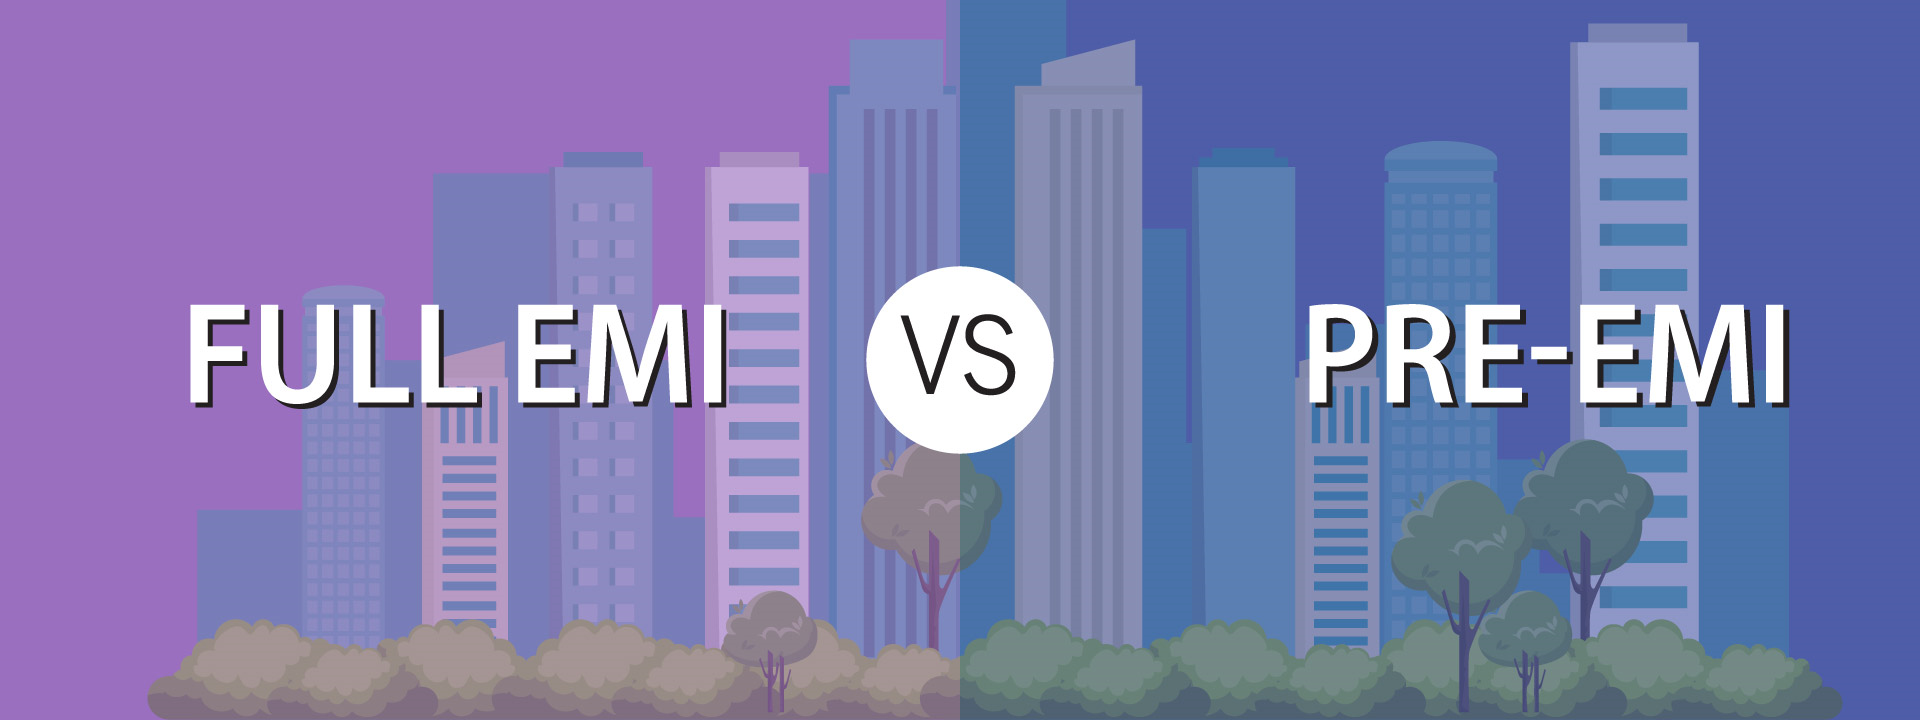 Full EMI vs Pre-EMI